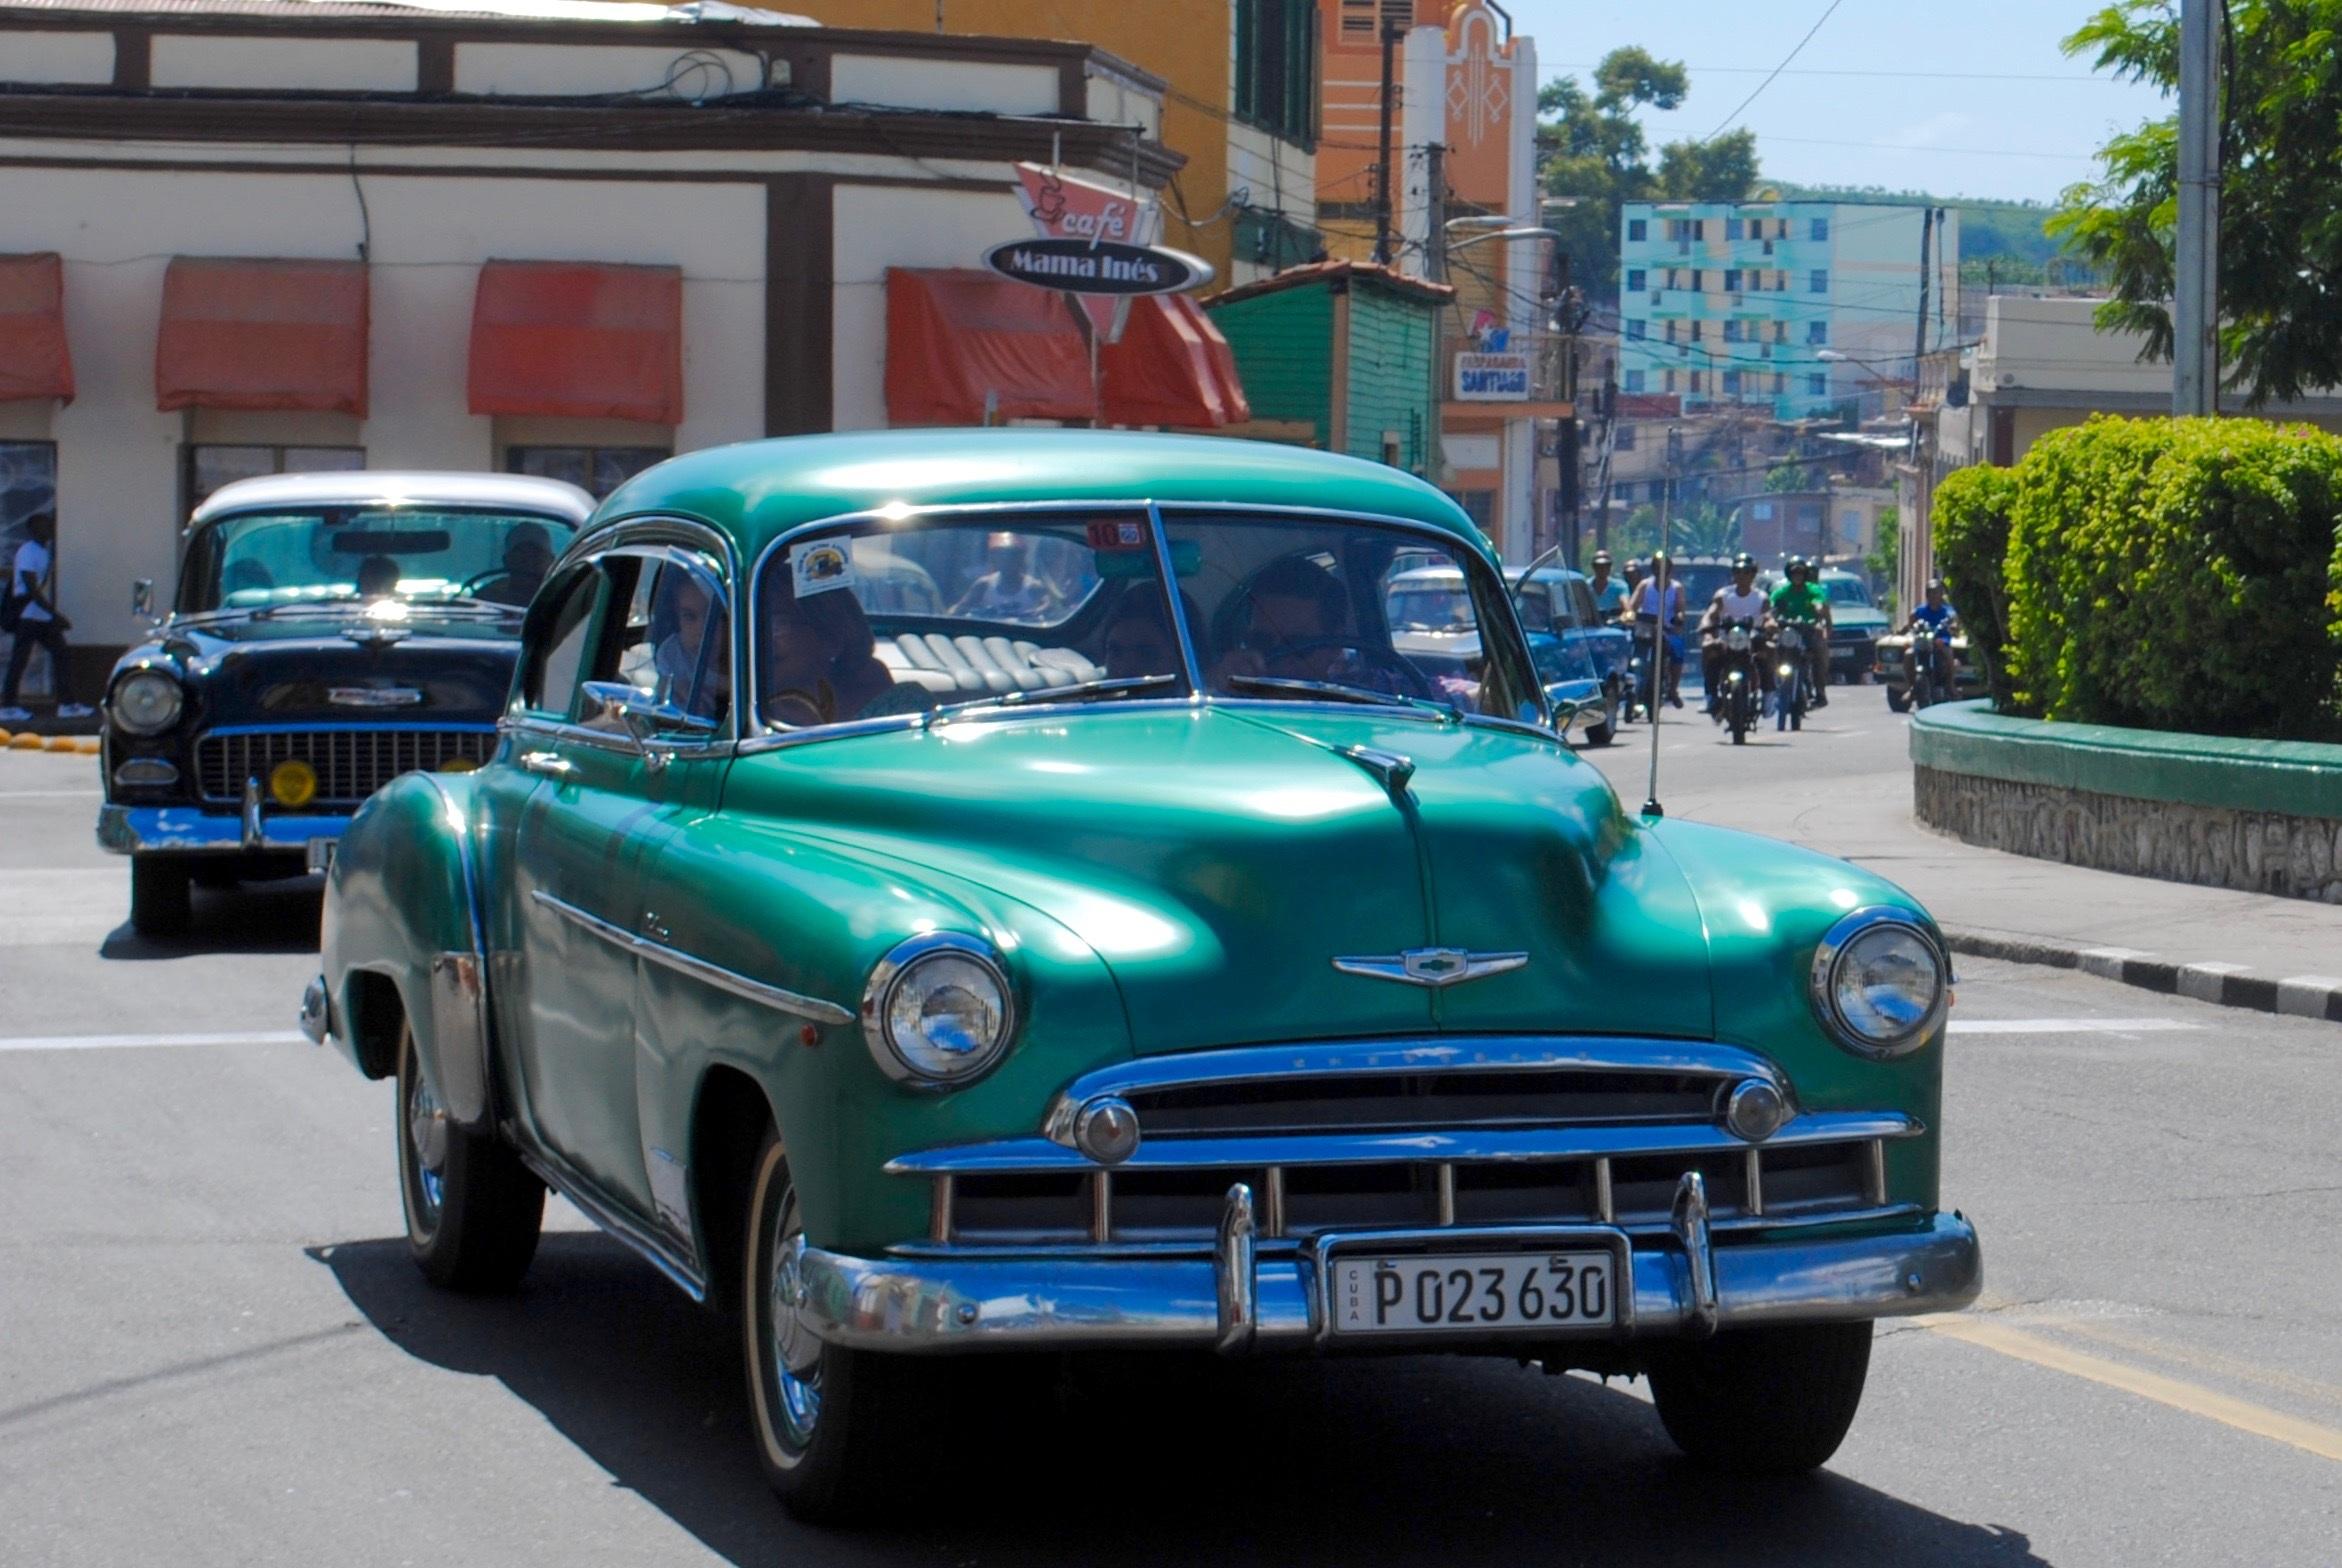 Free Images : street, retro, taxi, transportation, transport, green ...